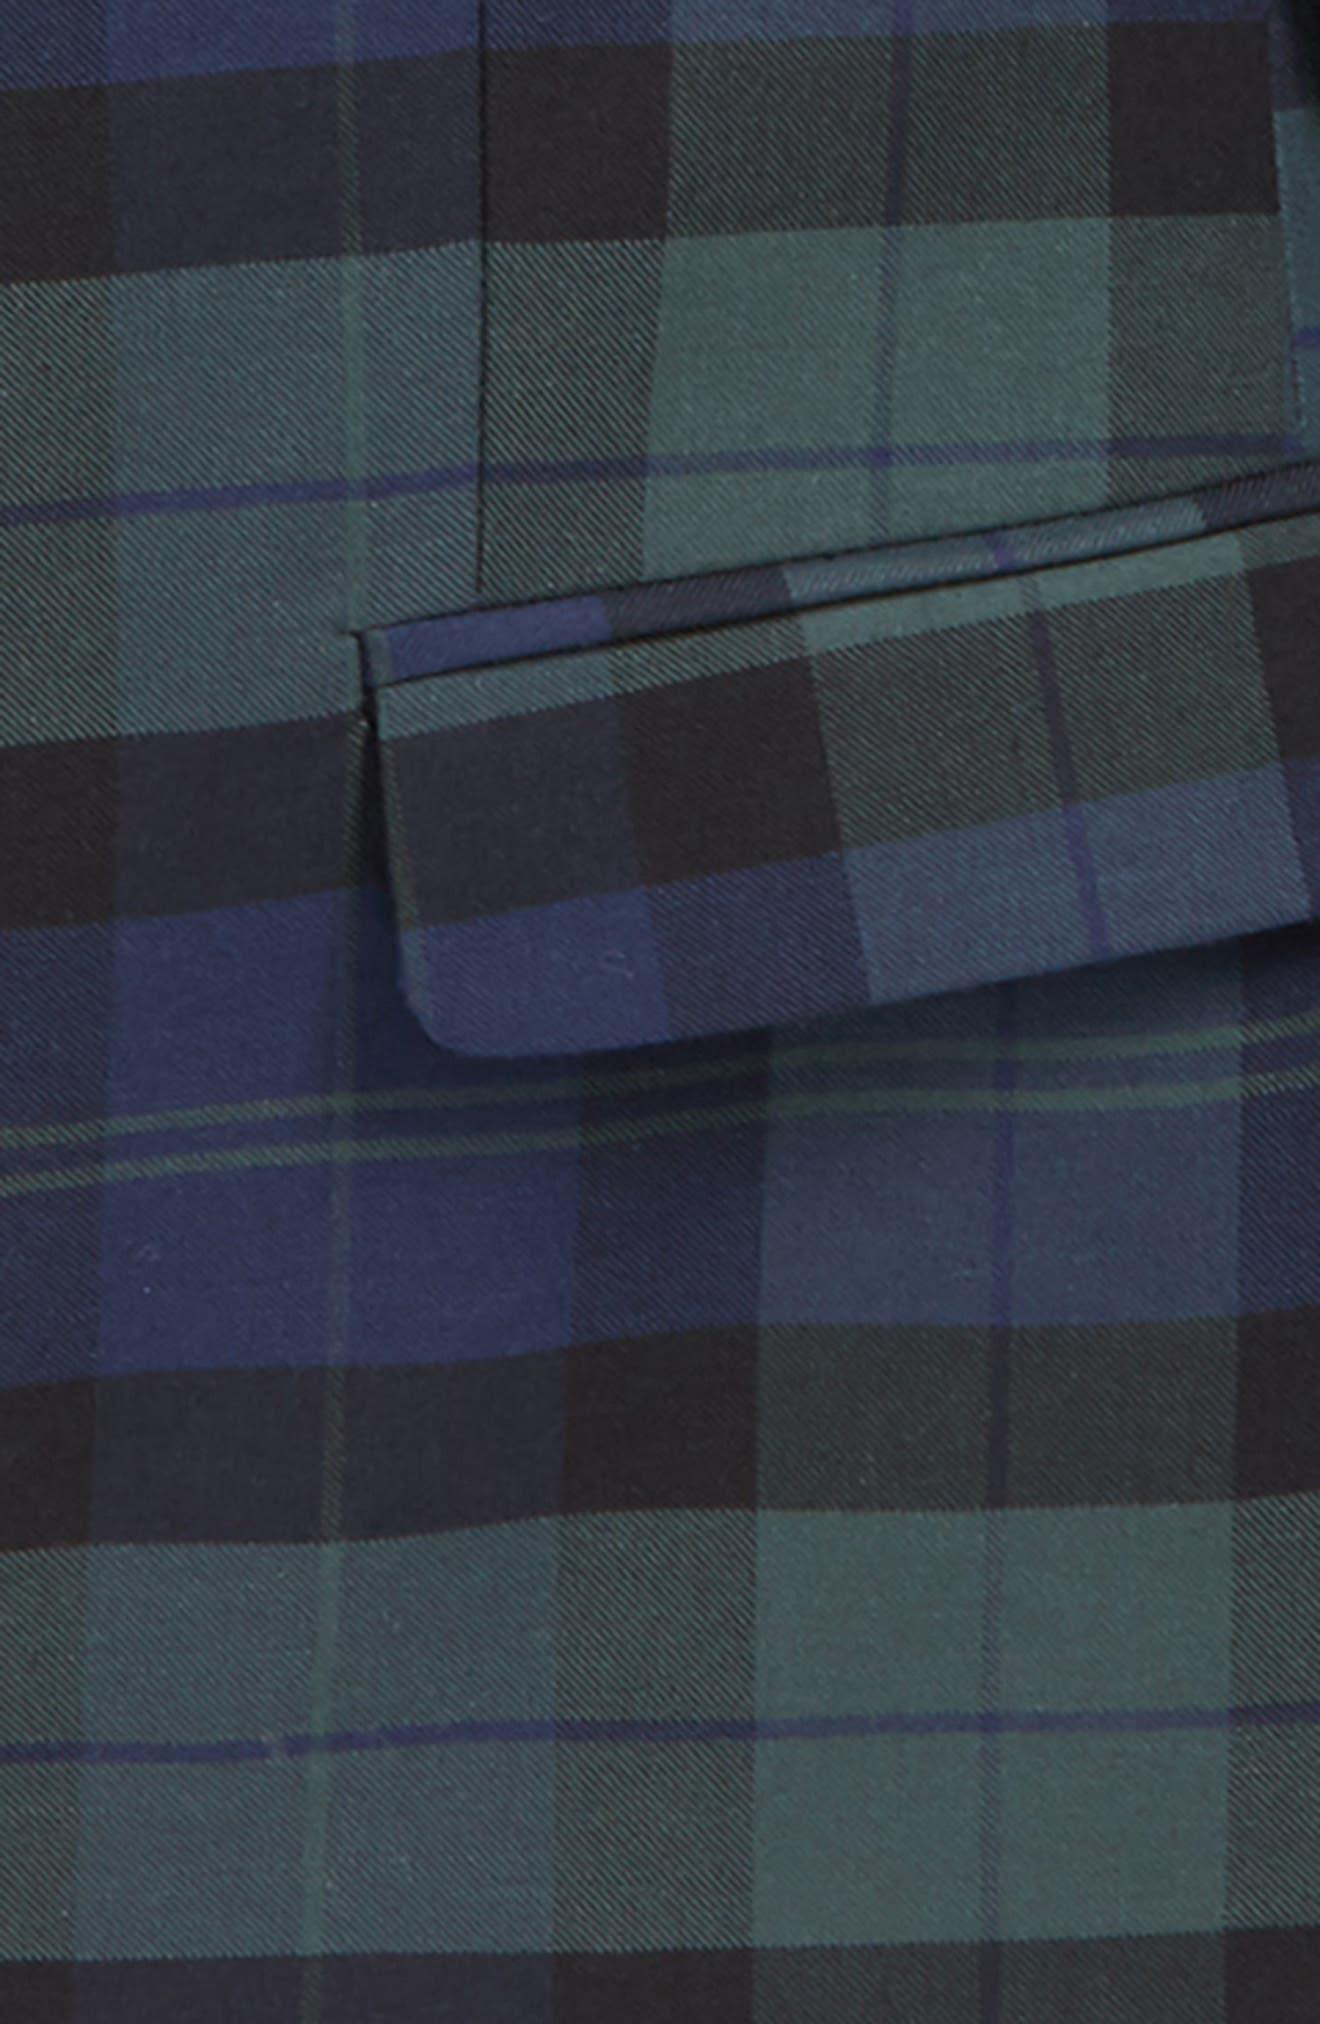 Holiday Tartan Plaid Blazer,                             Alternate thumbnail 2, color,                             Baltic Blue